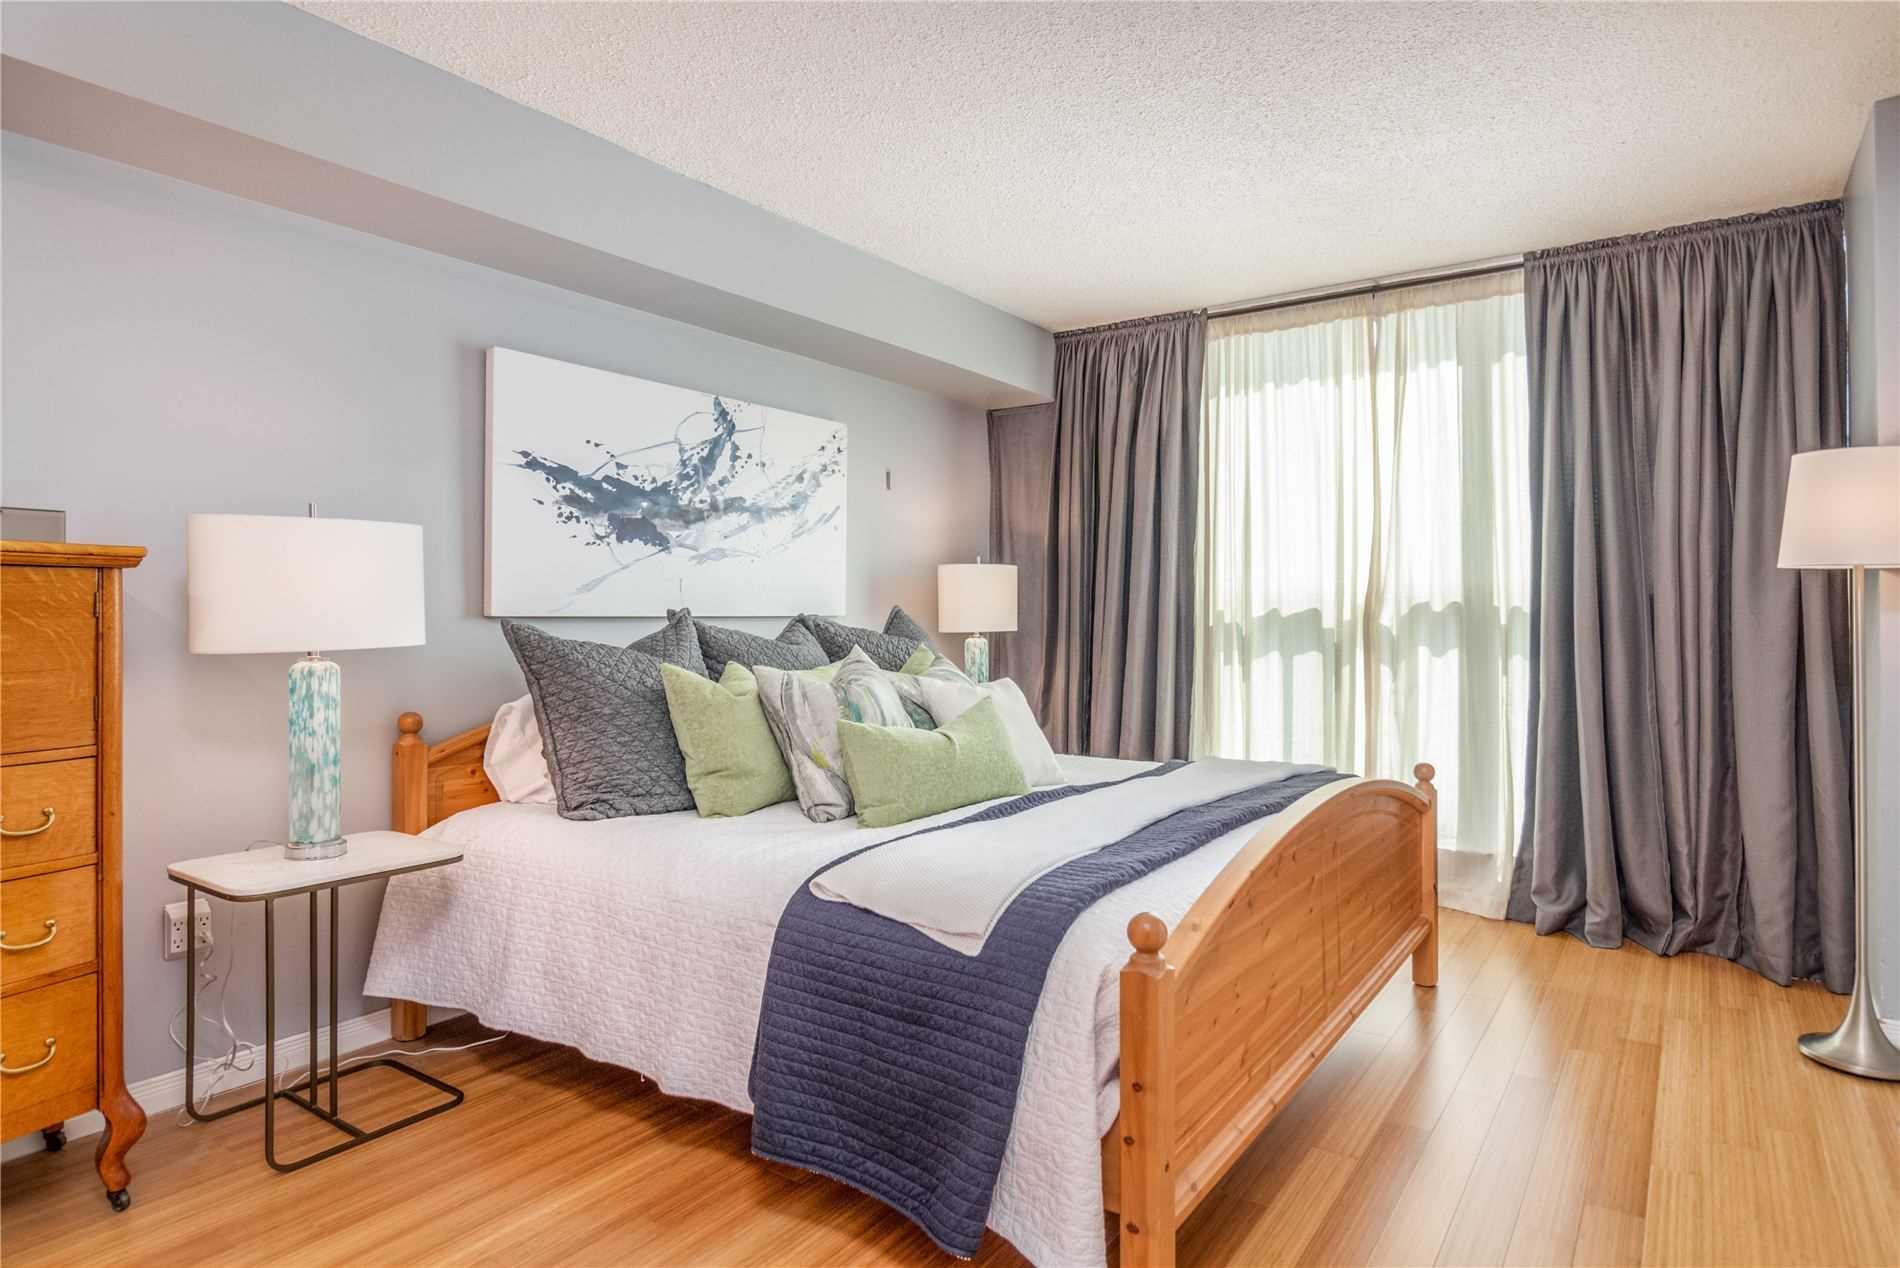 Condo Apt For Sale In Toronto , 2 Bedrooms Bedrooms, ,2 BathroomsBathrooms,Condo Apt,For Sale,1604,Elmhurst